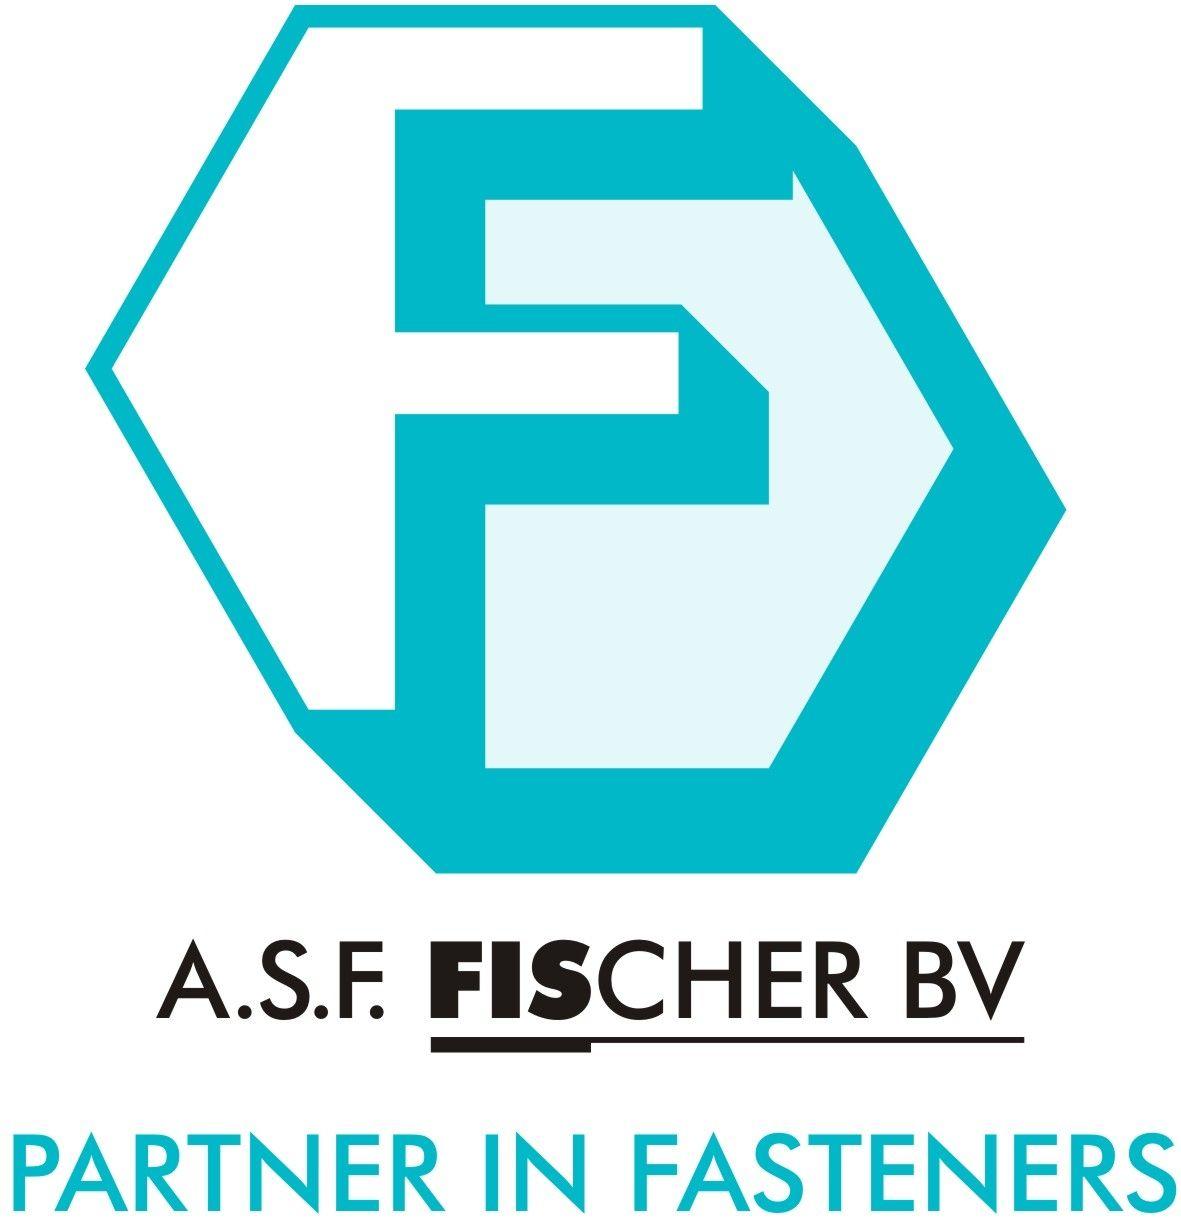 A.S.F. Fischer